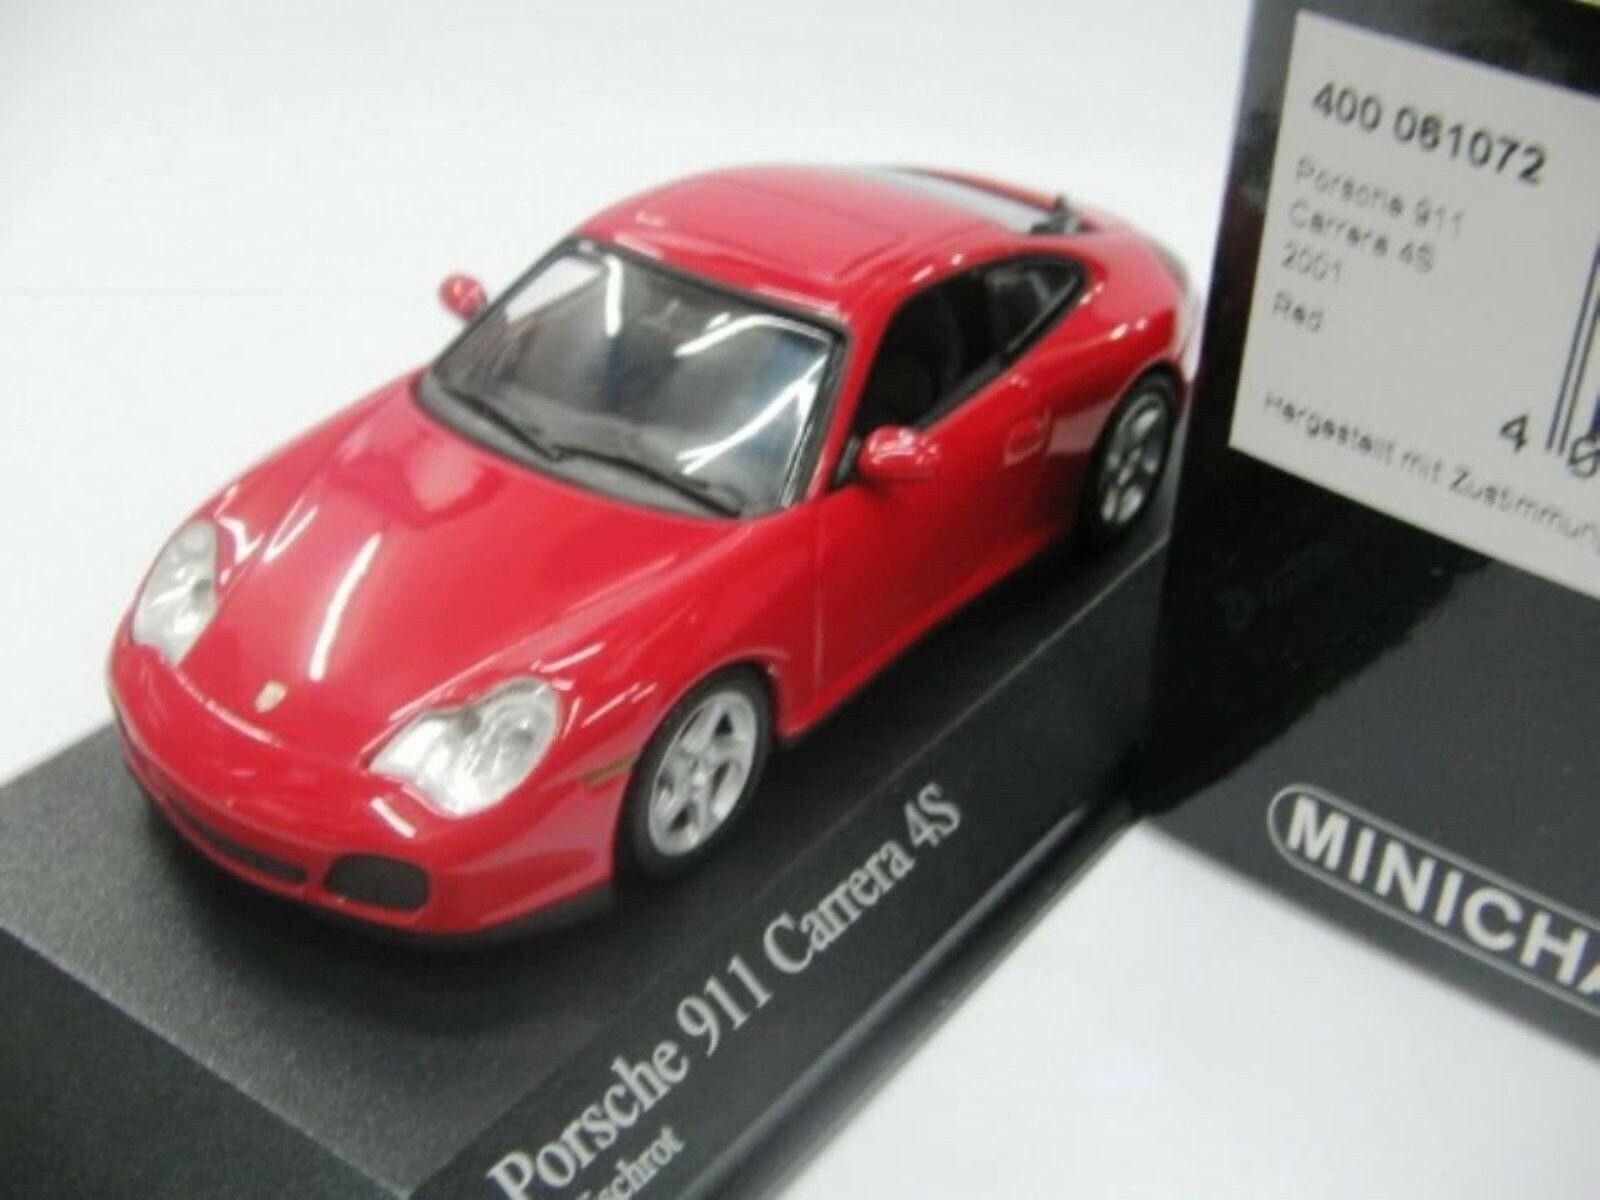 Wow extremadonnate raro Porsche 996 911 2001 C4 S Coupe rosso 1 43 Minichamps-GT2-Spark